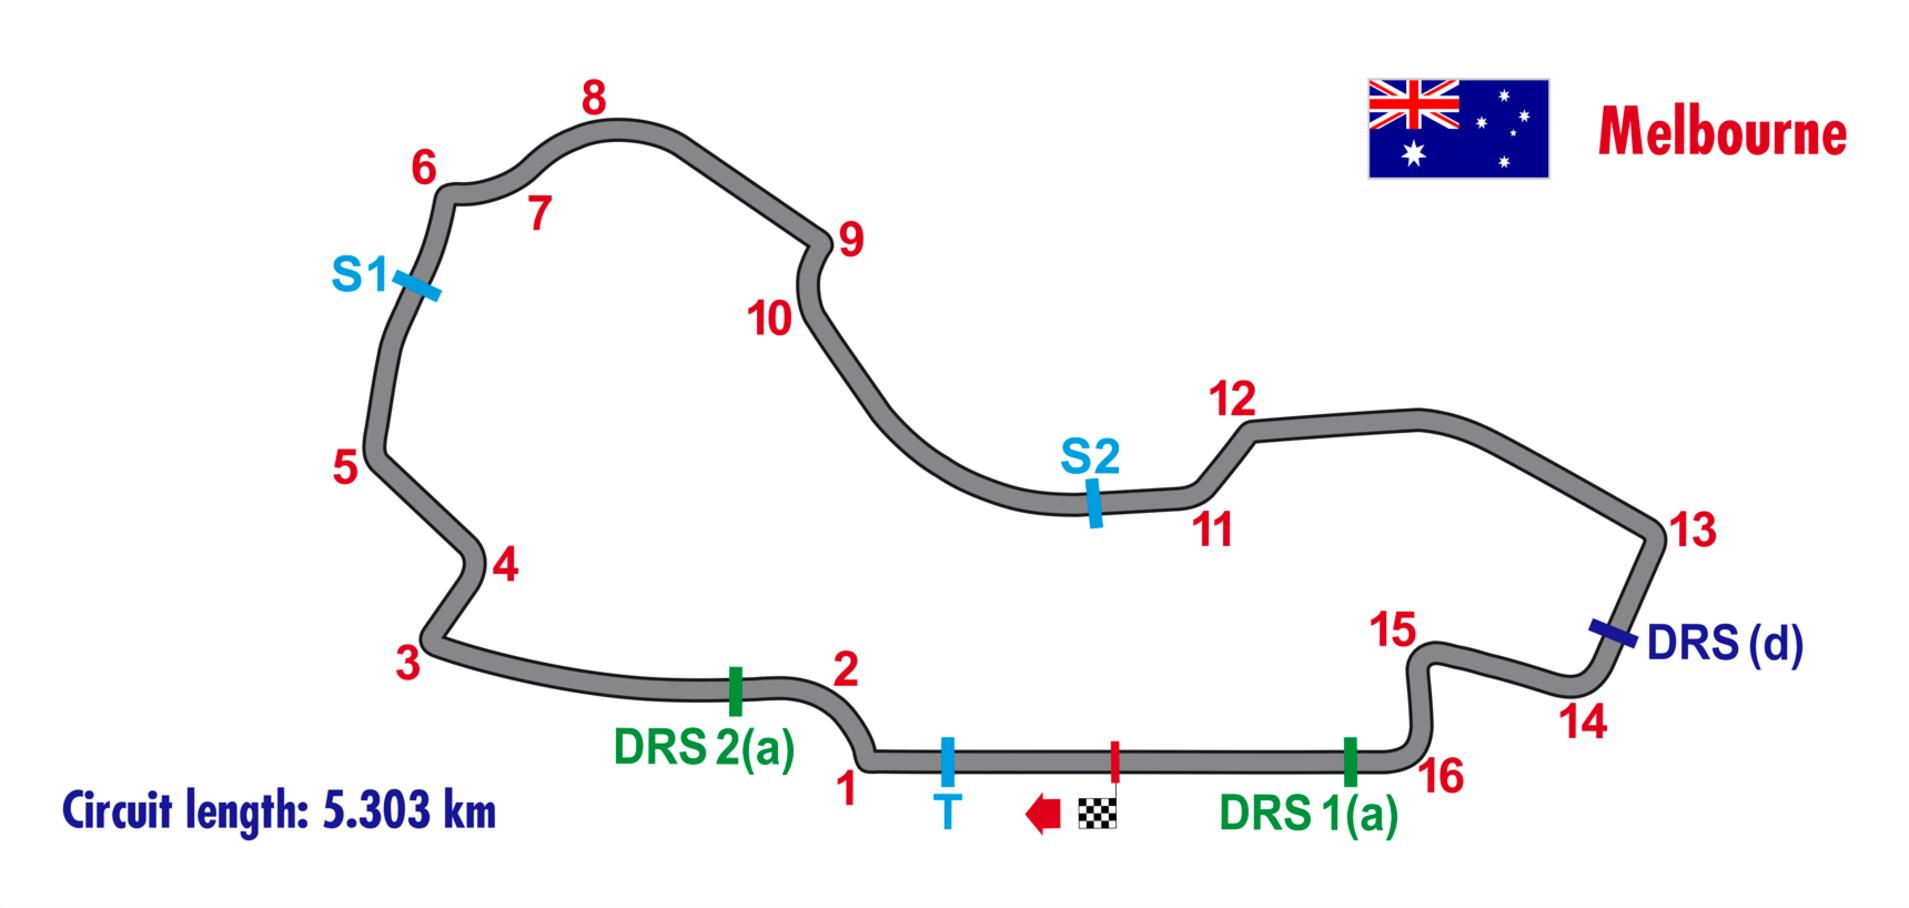 Grand Prix d'Australie 2020